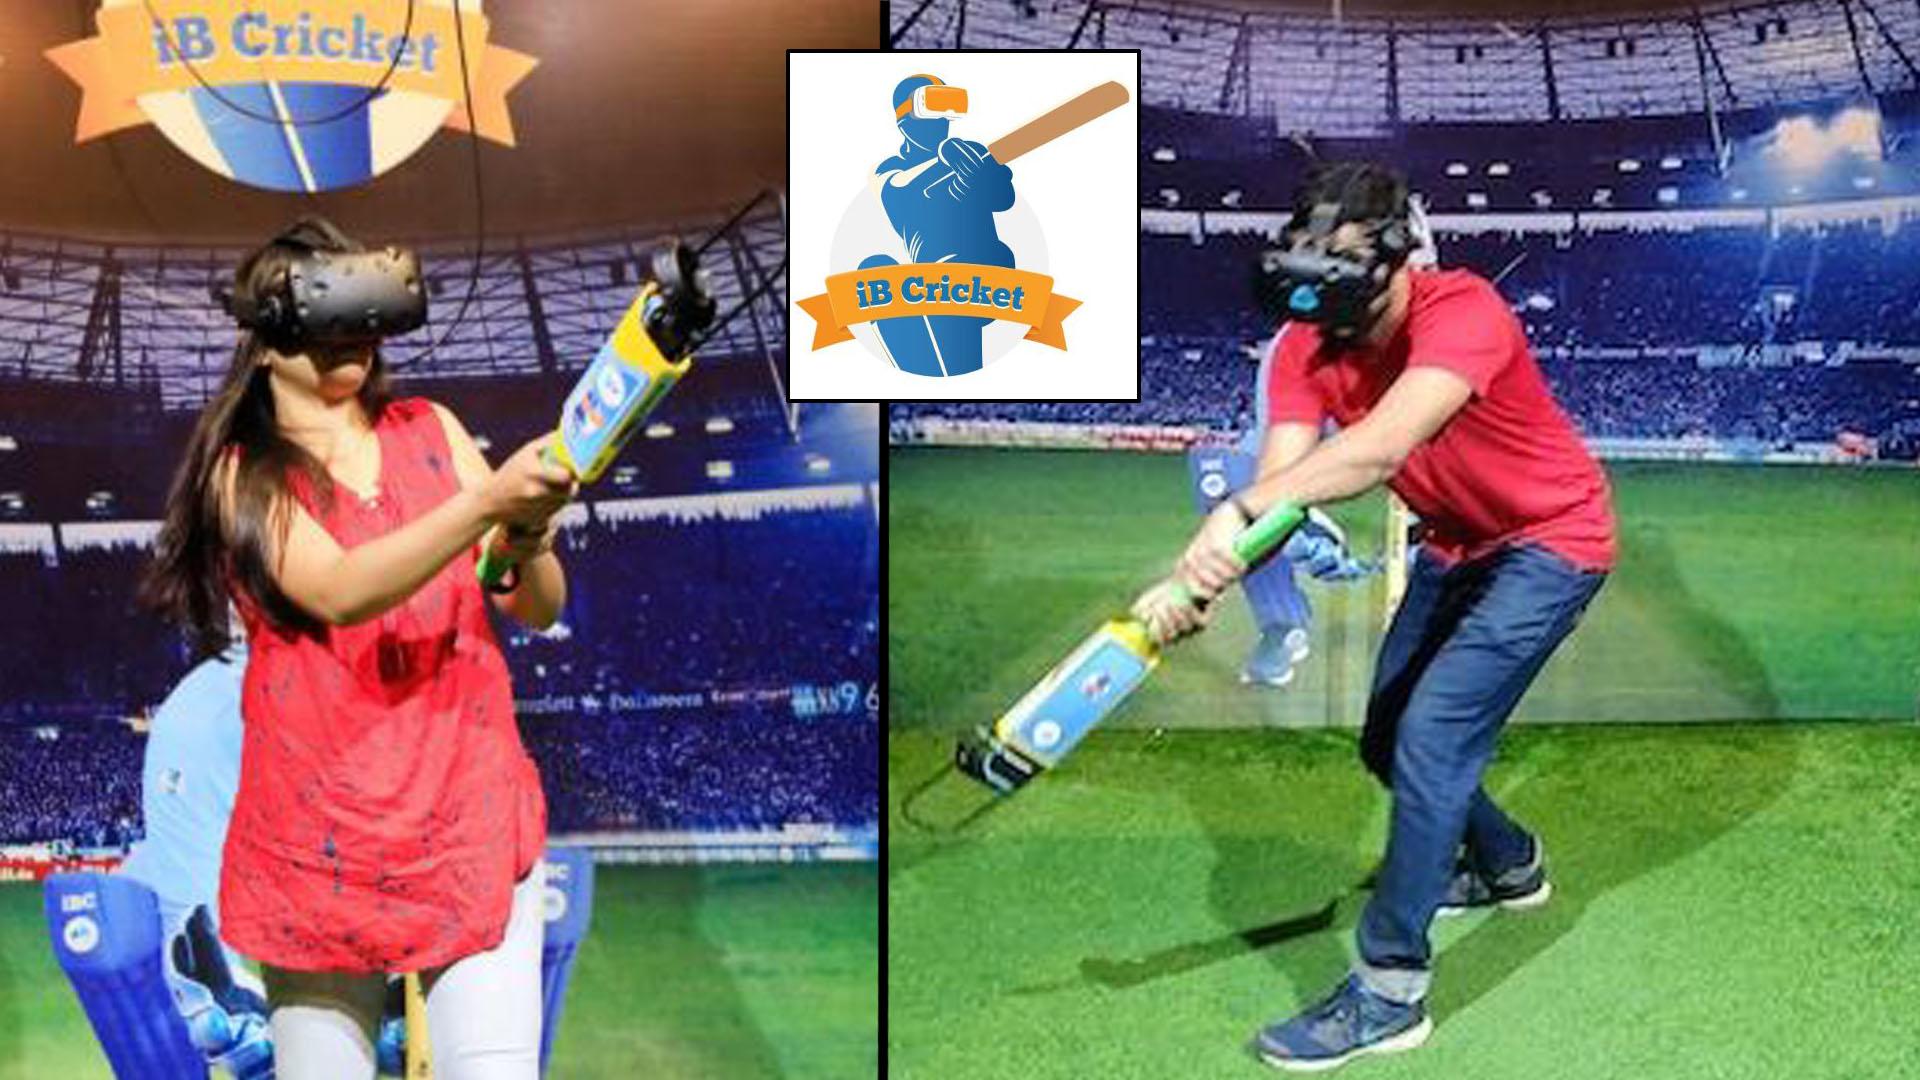 ICC Cricket World Cup 2019 : IB Cricket Attracting Hyderabad Cricket Fans !    Oneindia Telugu